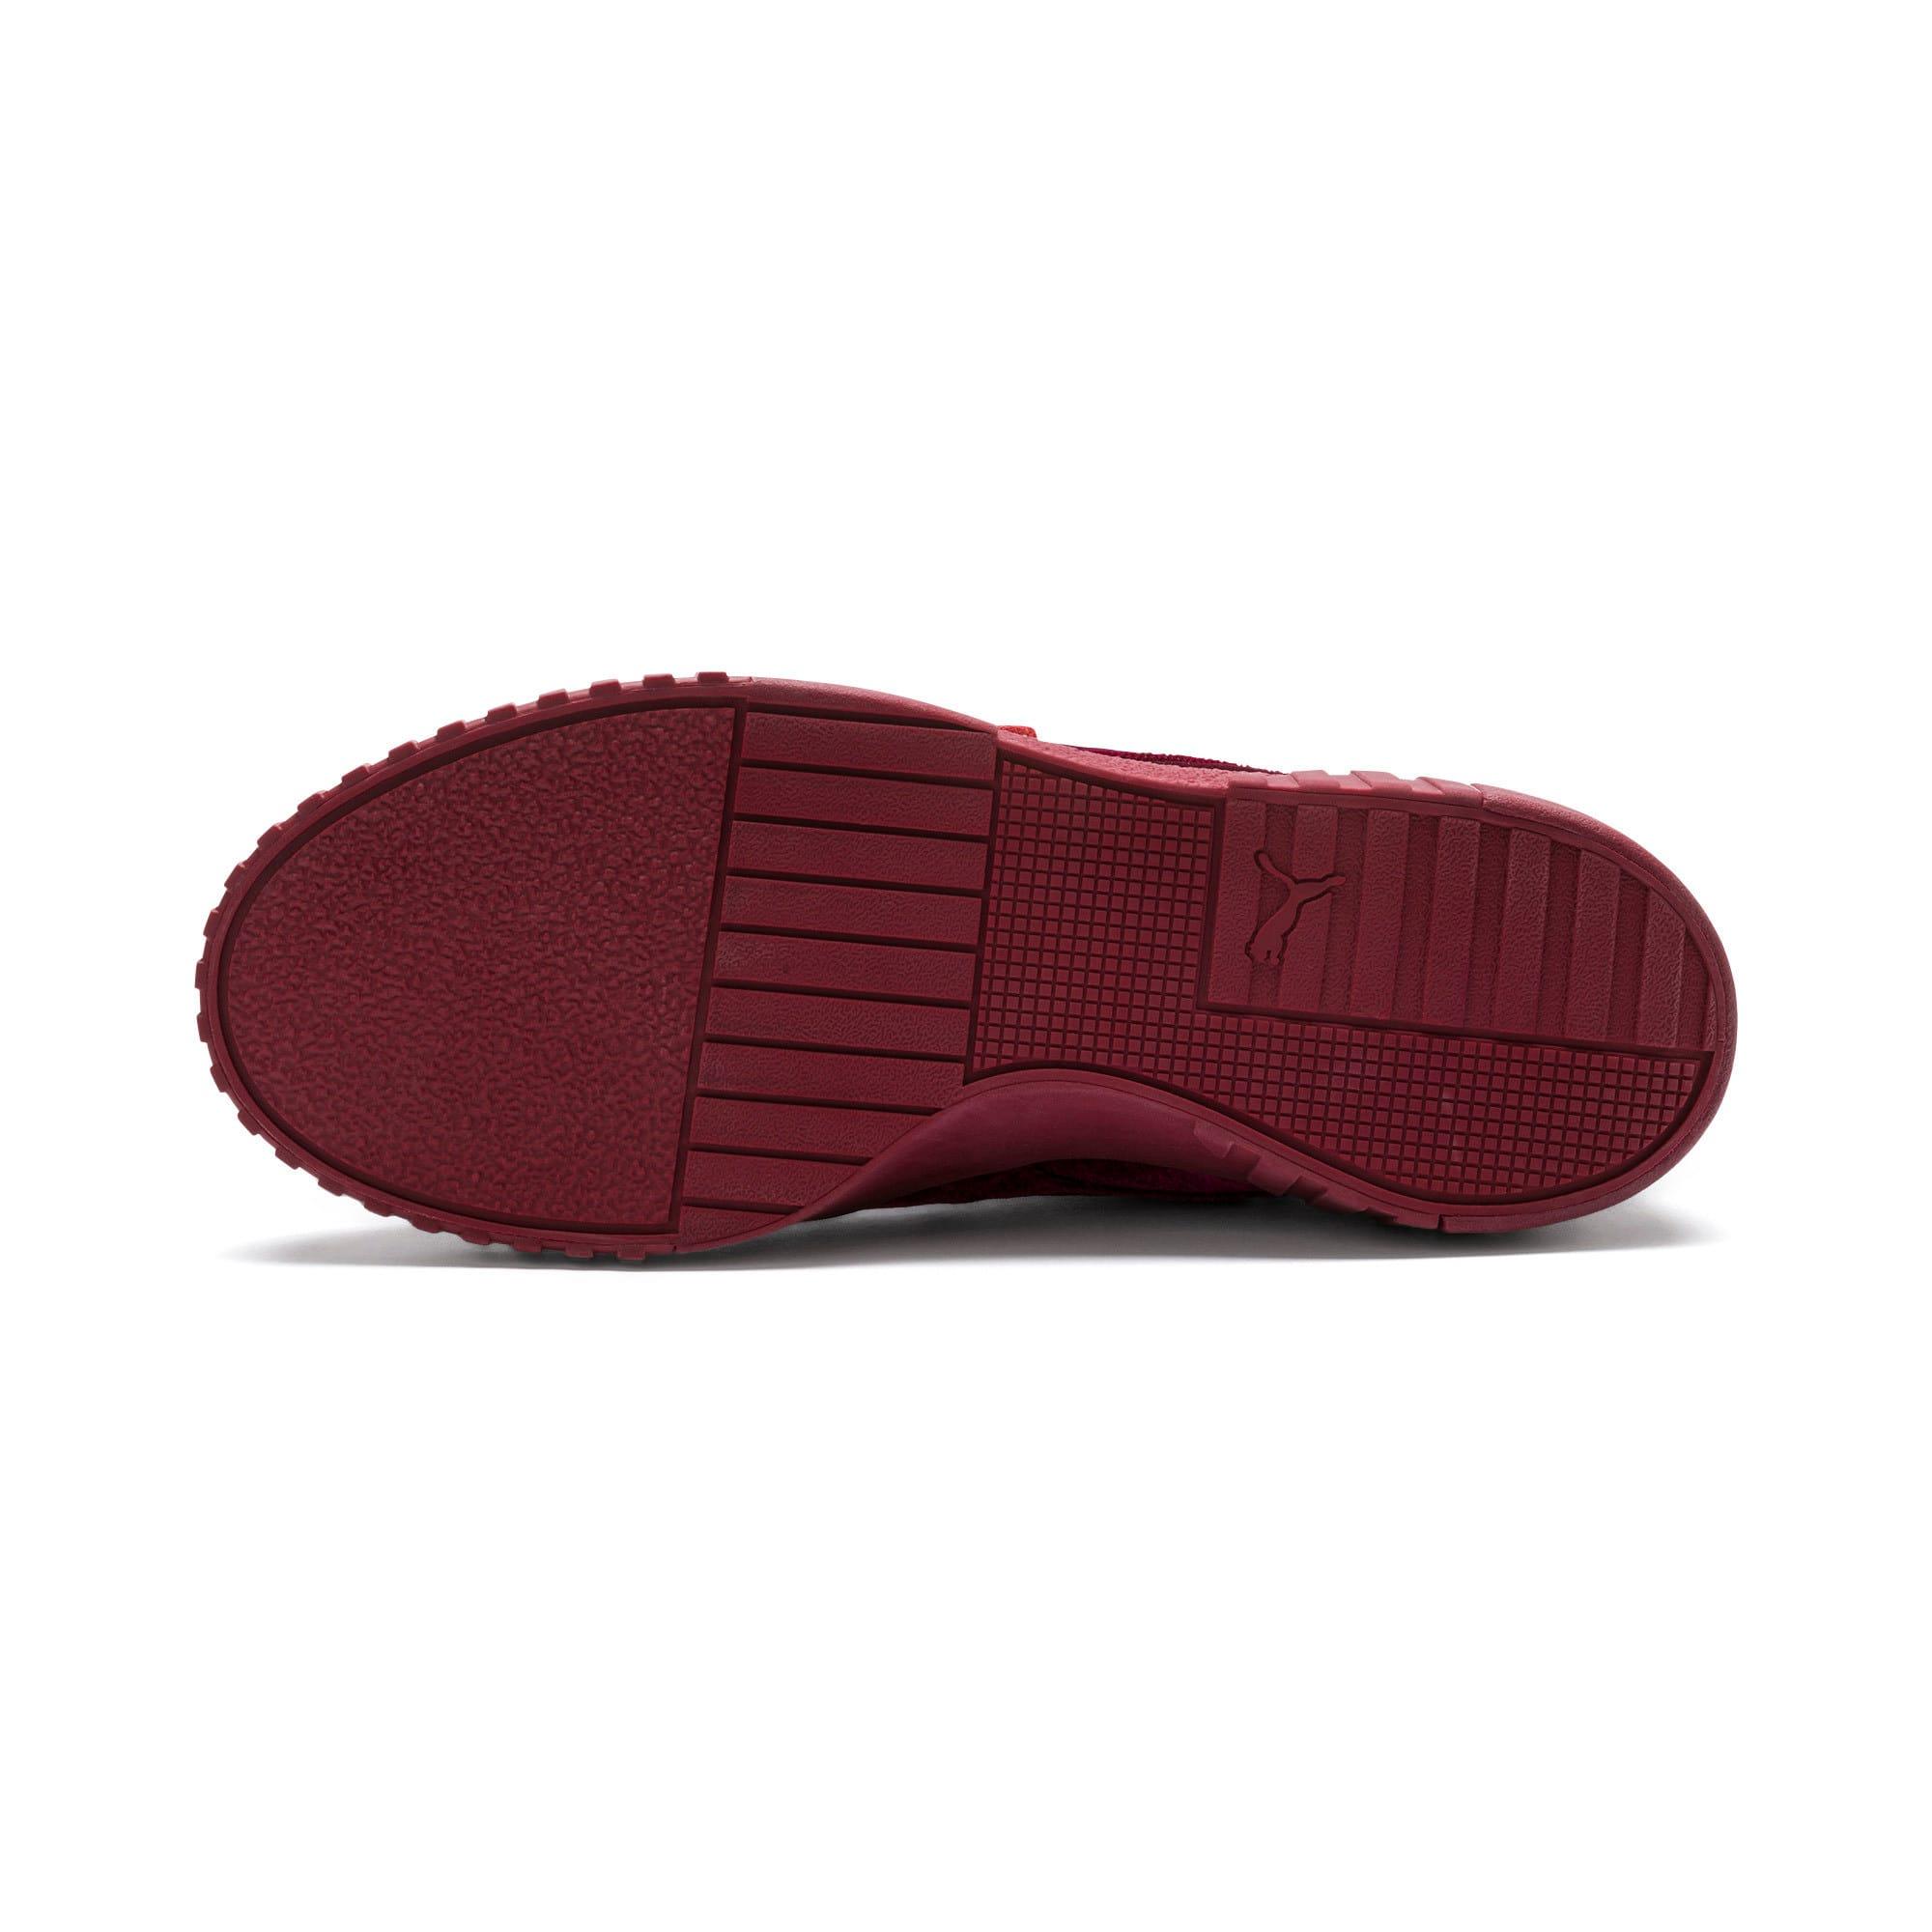 Miniatura 3 de Zapatos deportivosCali Velvetpara mujer, Tibetan Red-Tibetan Red, mediano